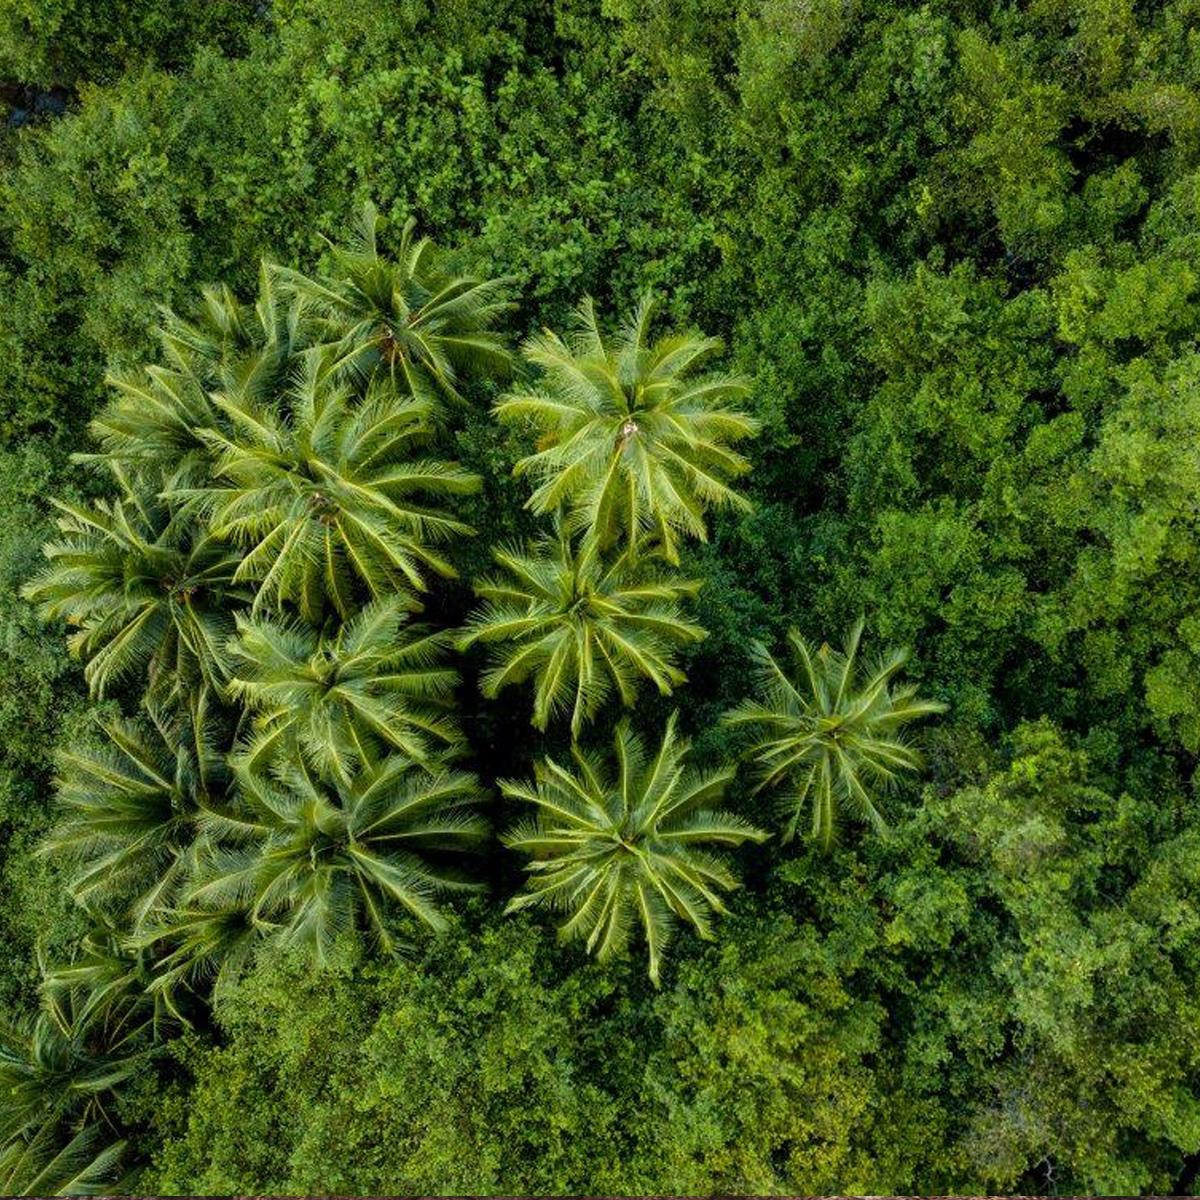 Costa Rica © Berti Benabaste | unsplash